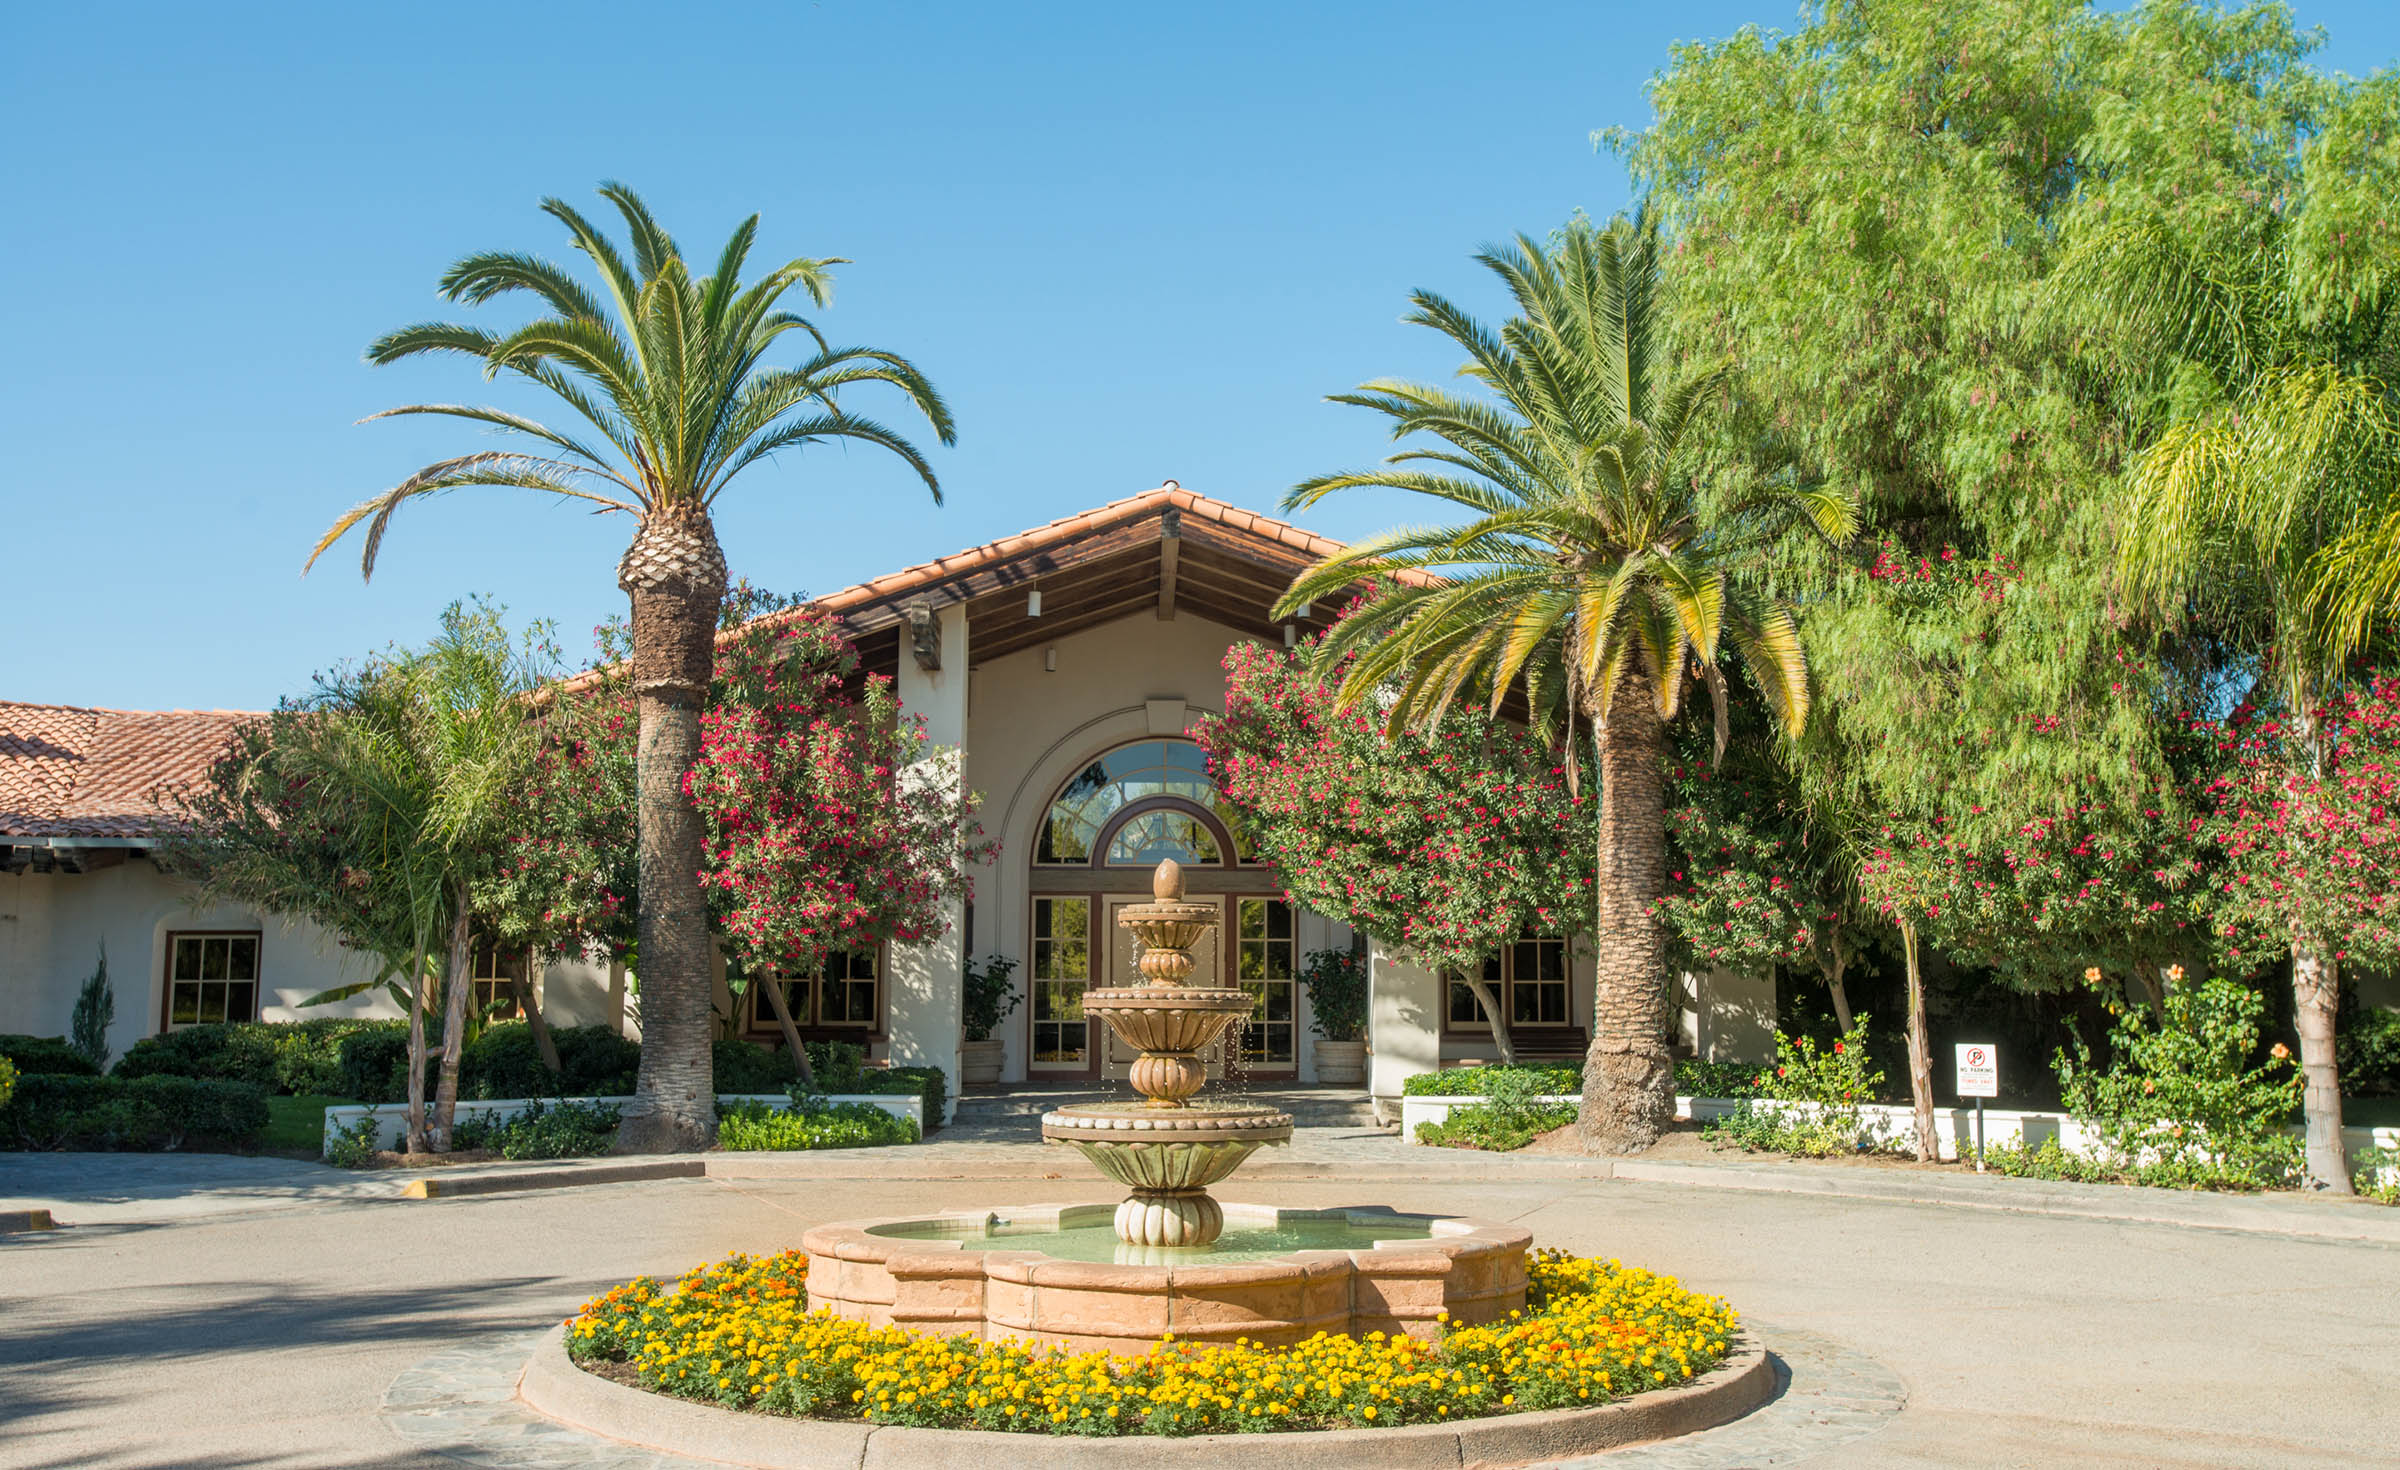 Romantic fountain courtyard ceremony - Menifee Lakes - Menifee, California - Riverside County - Wedgewood Weddings